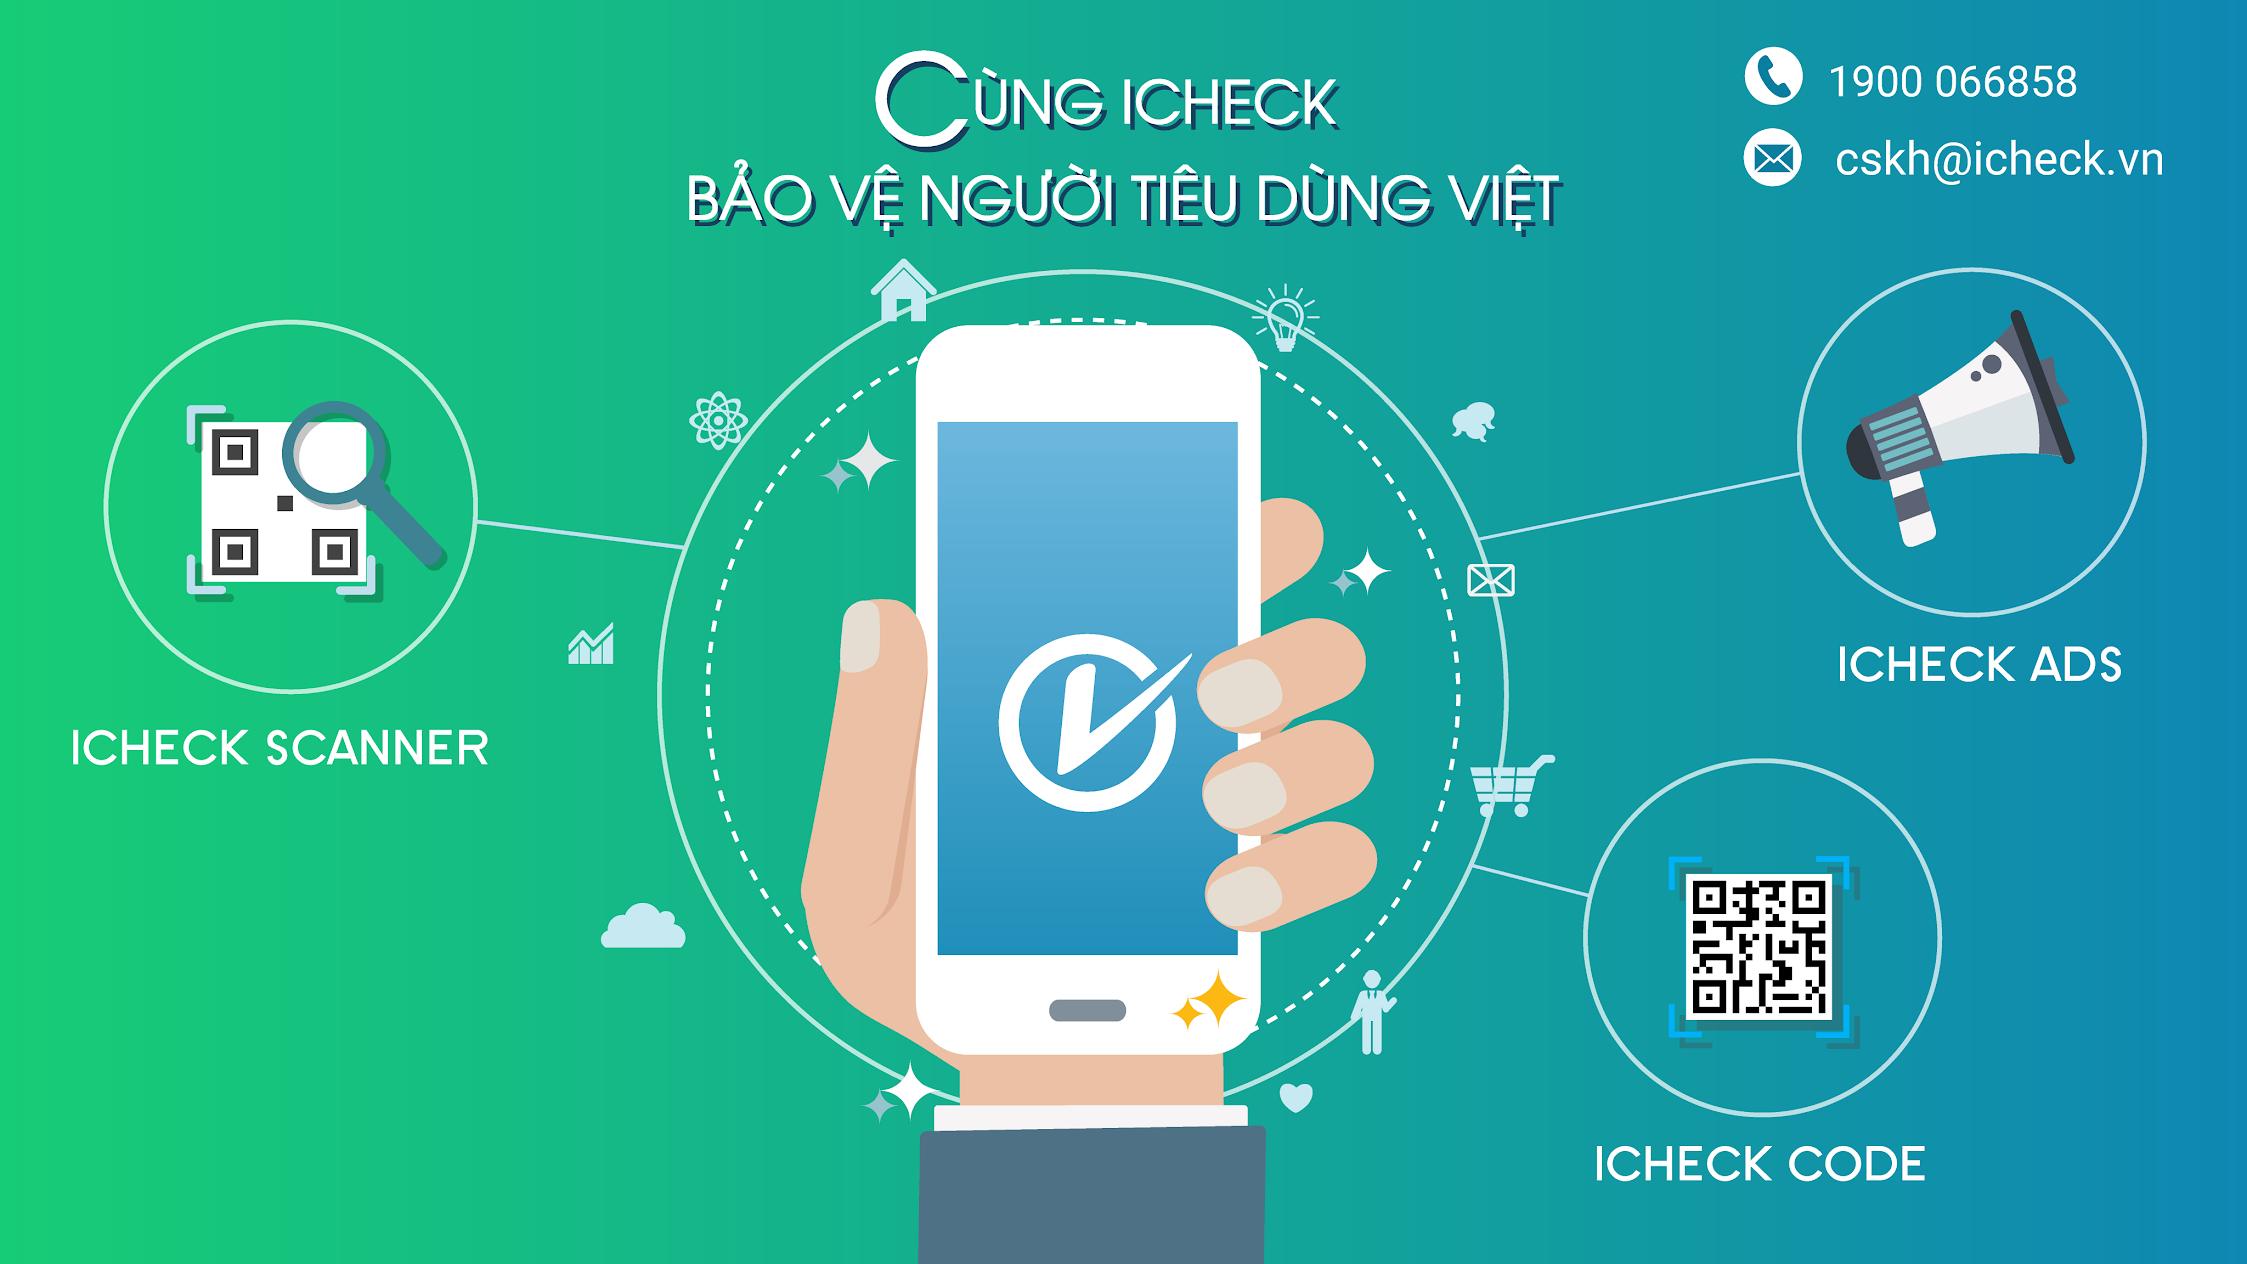 iCheck Corporation